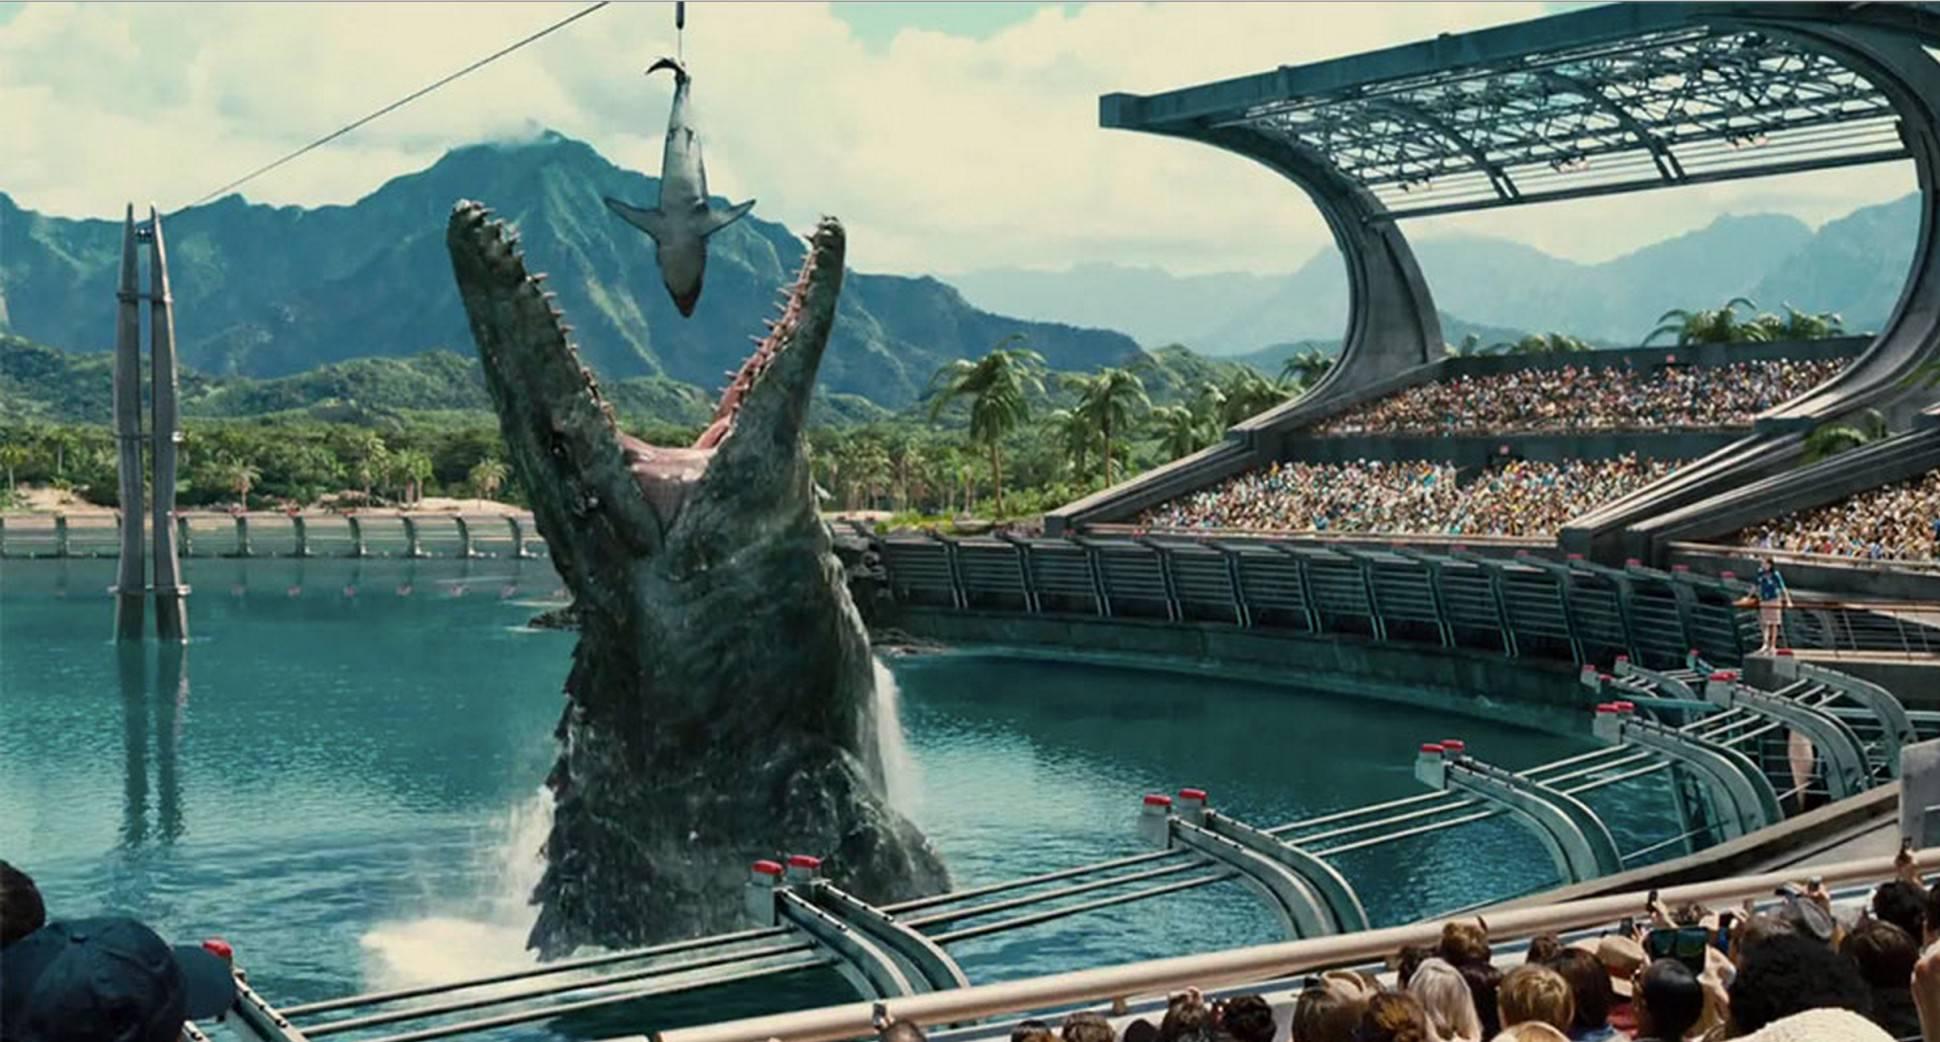 Download Jurassic World Hollywood bluray full movie 2015